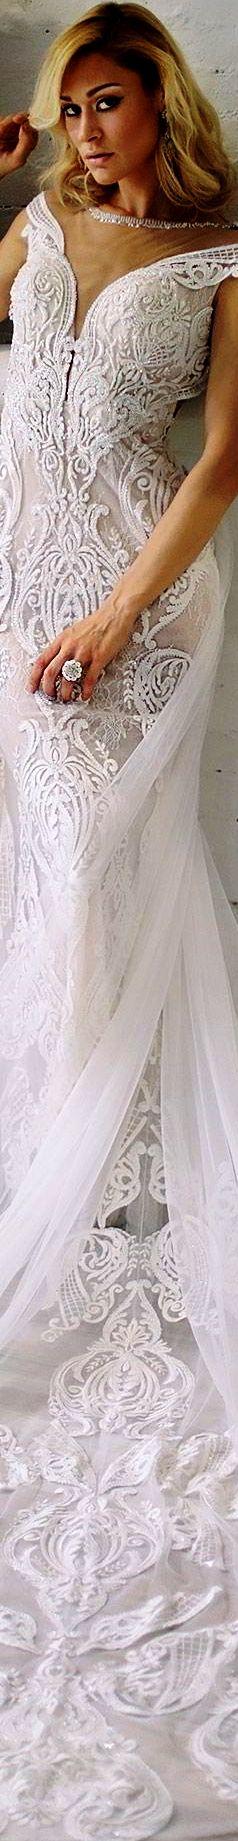 Sarah Jassir Bridal 2018 off shoulder deep V-neck illusion jewel neckline cap sleeves sheath lace wedding dress andi chapel train elegant